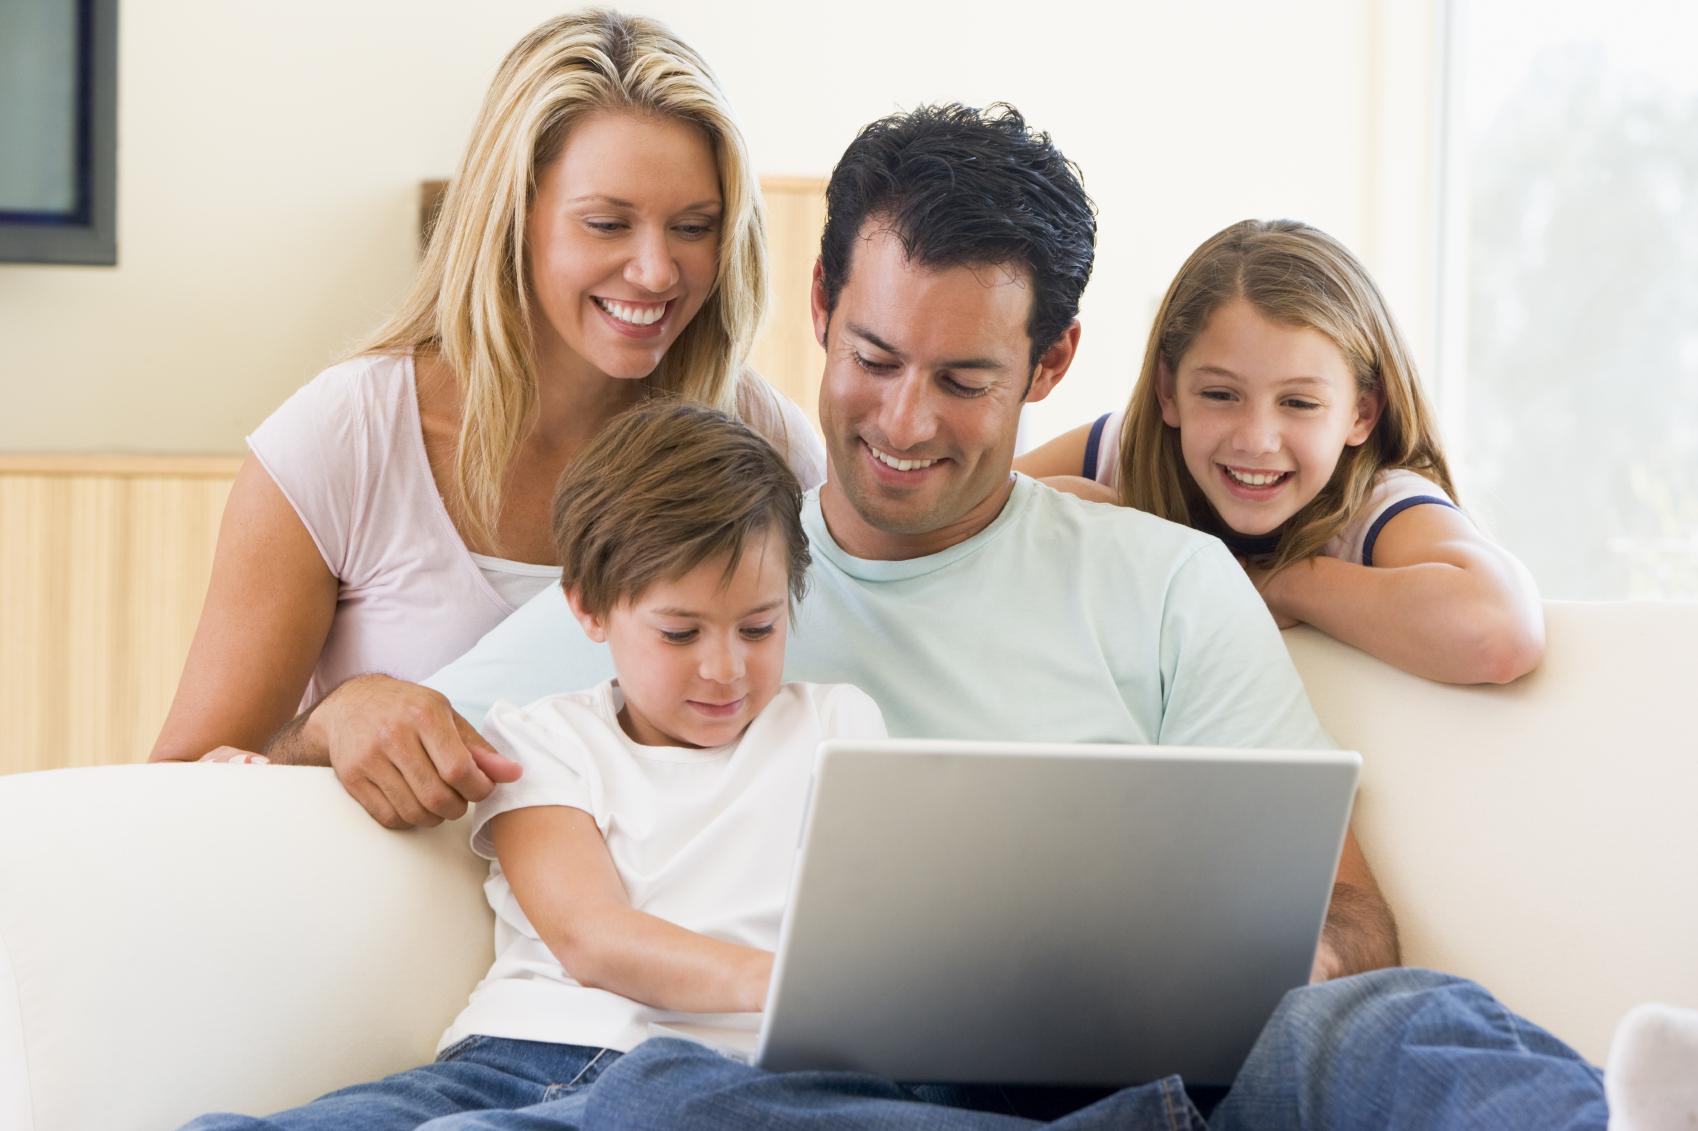 Lindungi Jaringan Internet Rumah Anda